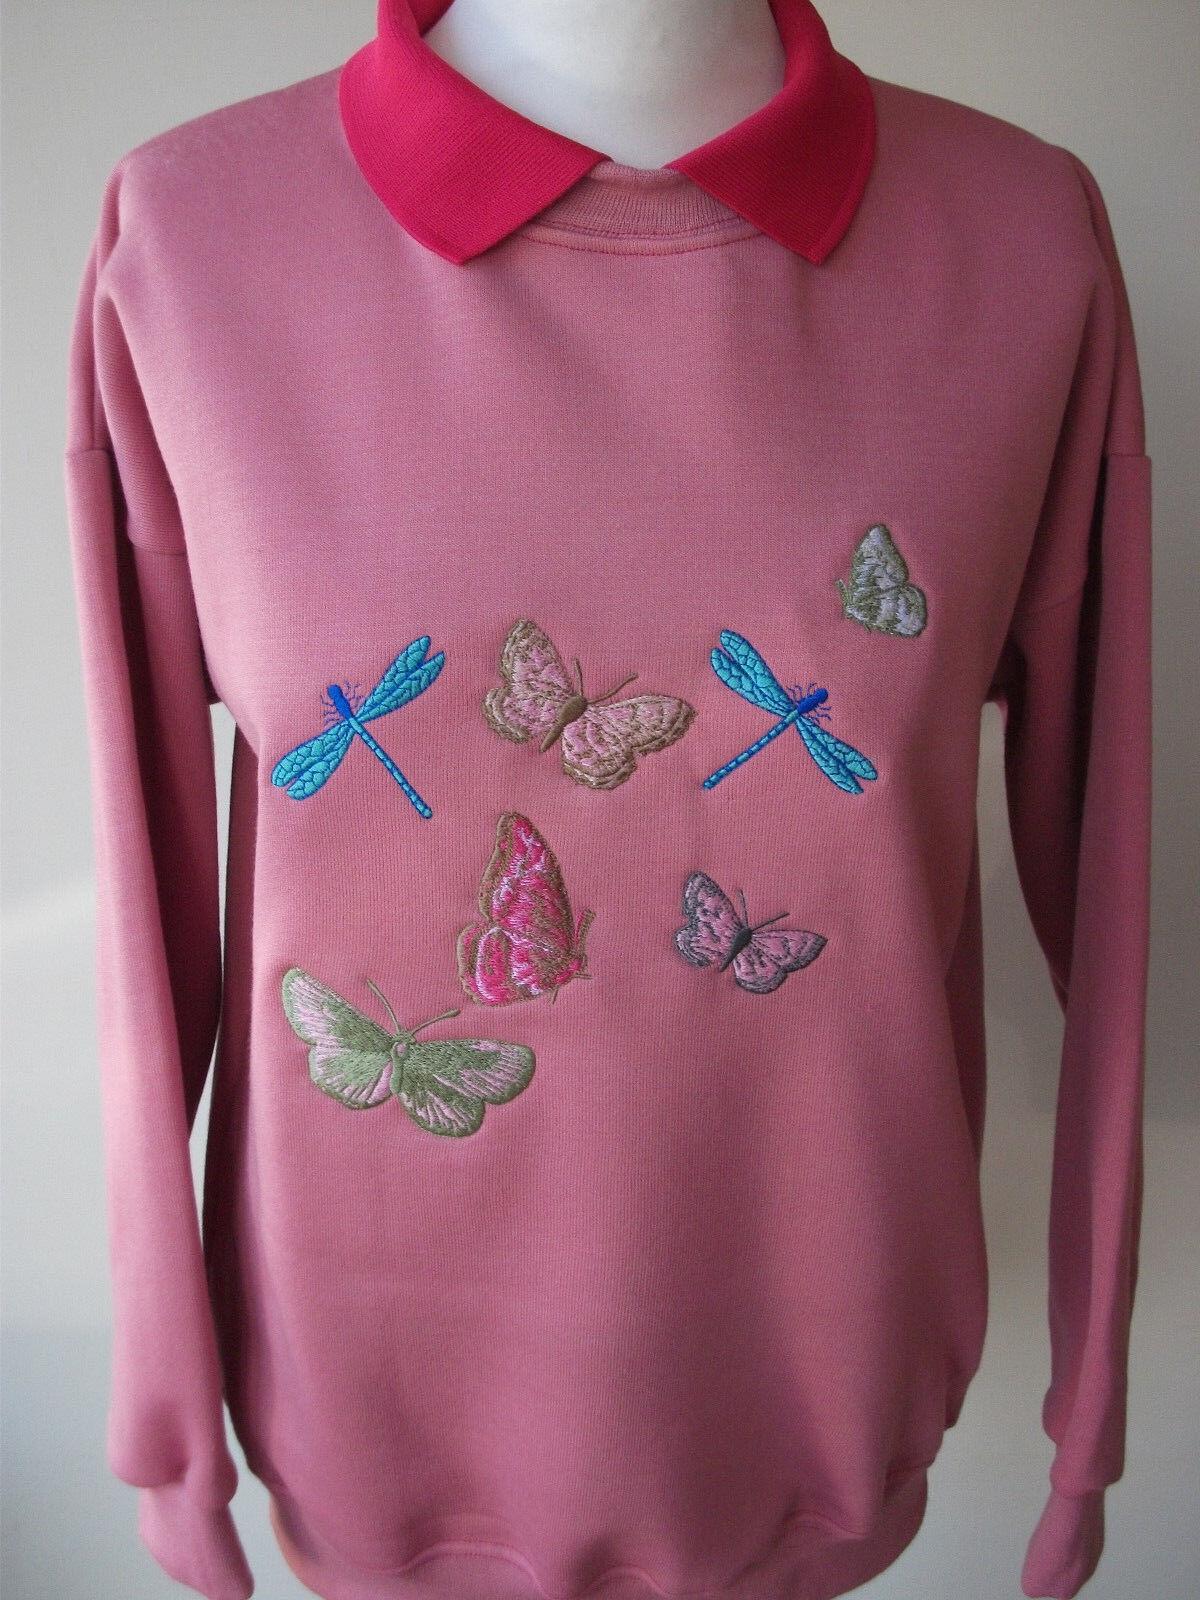 LADIES LADIES LADIES SWEATSHIRT,JUMPER,TOP PINK PINK WITH AN EMBROIDERED BUTTERFLIES DESIGN 5f2adb